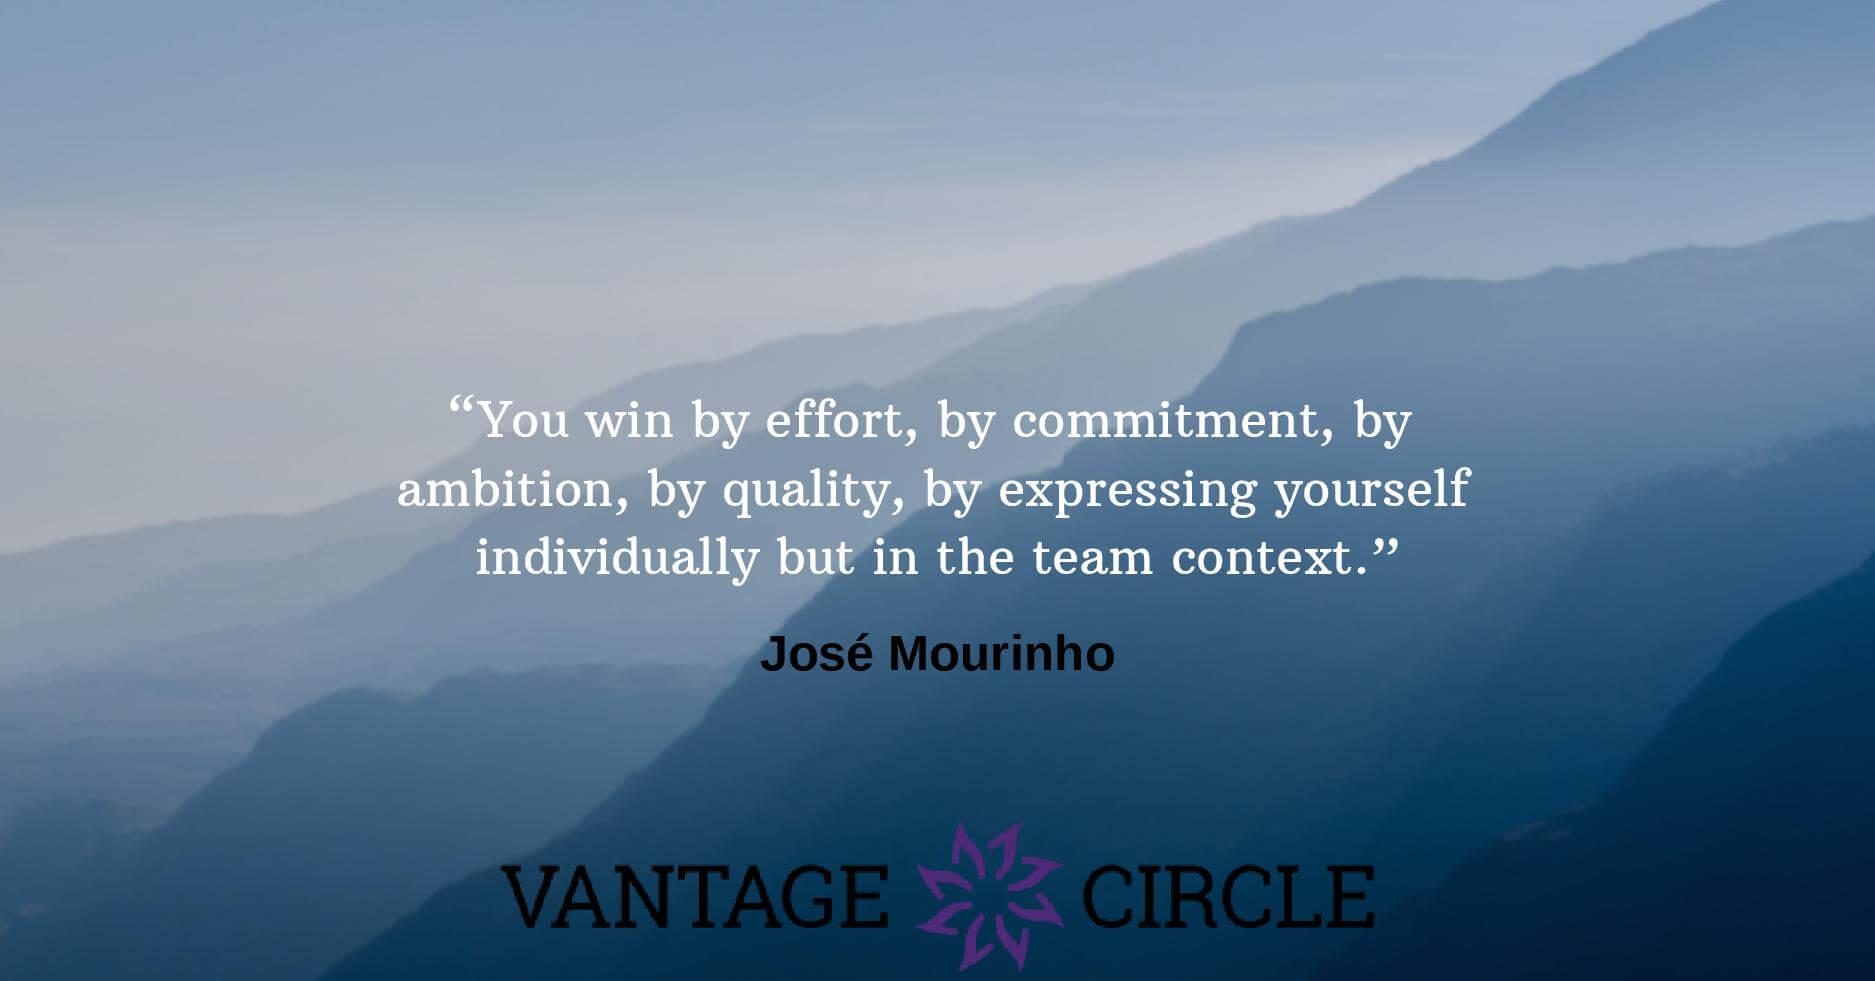 Employee-motivational-quotes-Jose-Mourinho-1